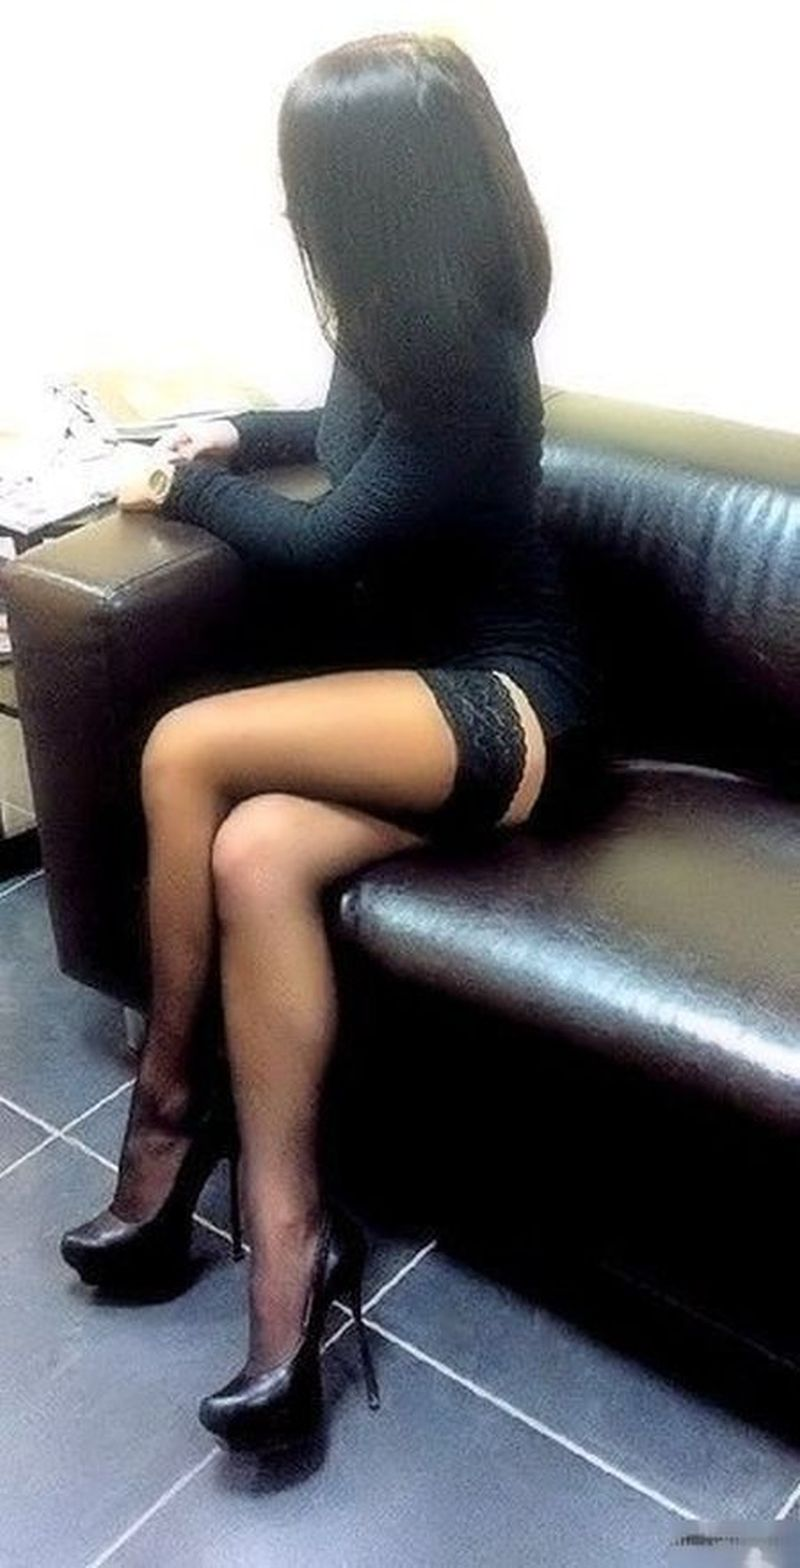 Фото в чулках нога на ногу 1 фотография